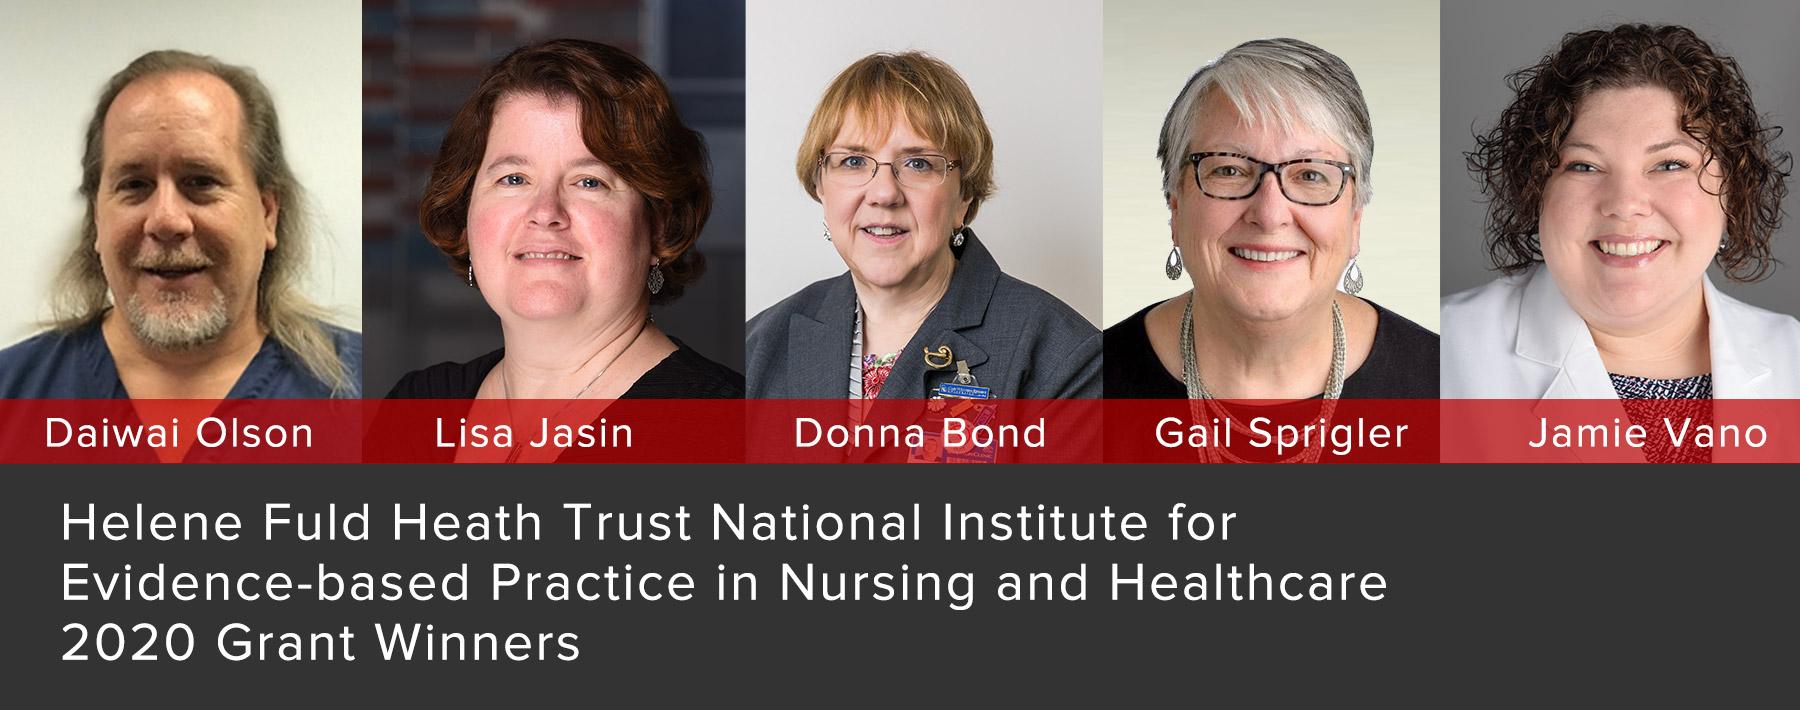 Headshots of the five grant winners